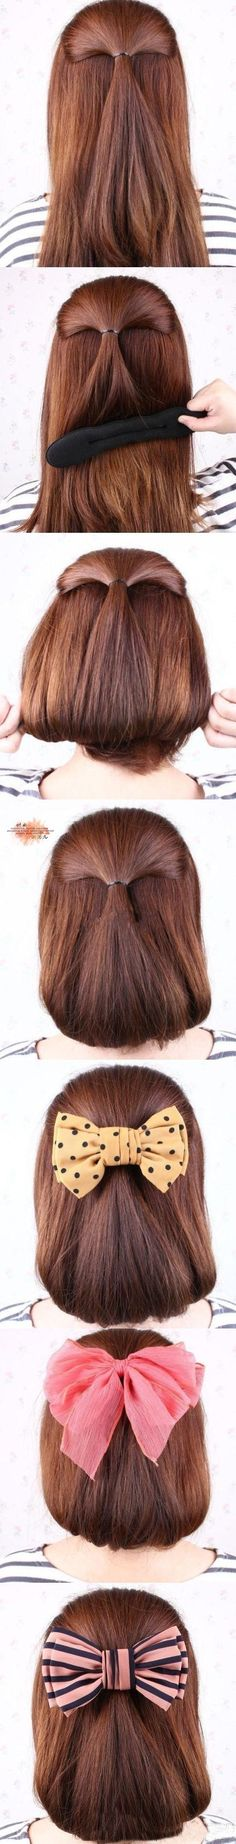 DIY Cute Hair Style